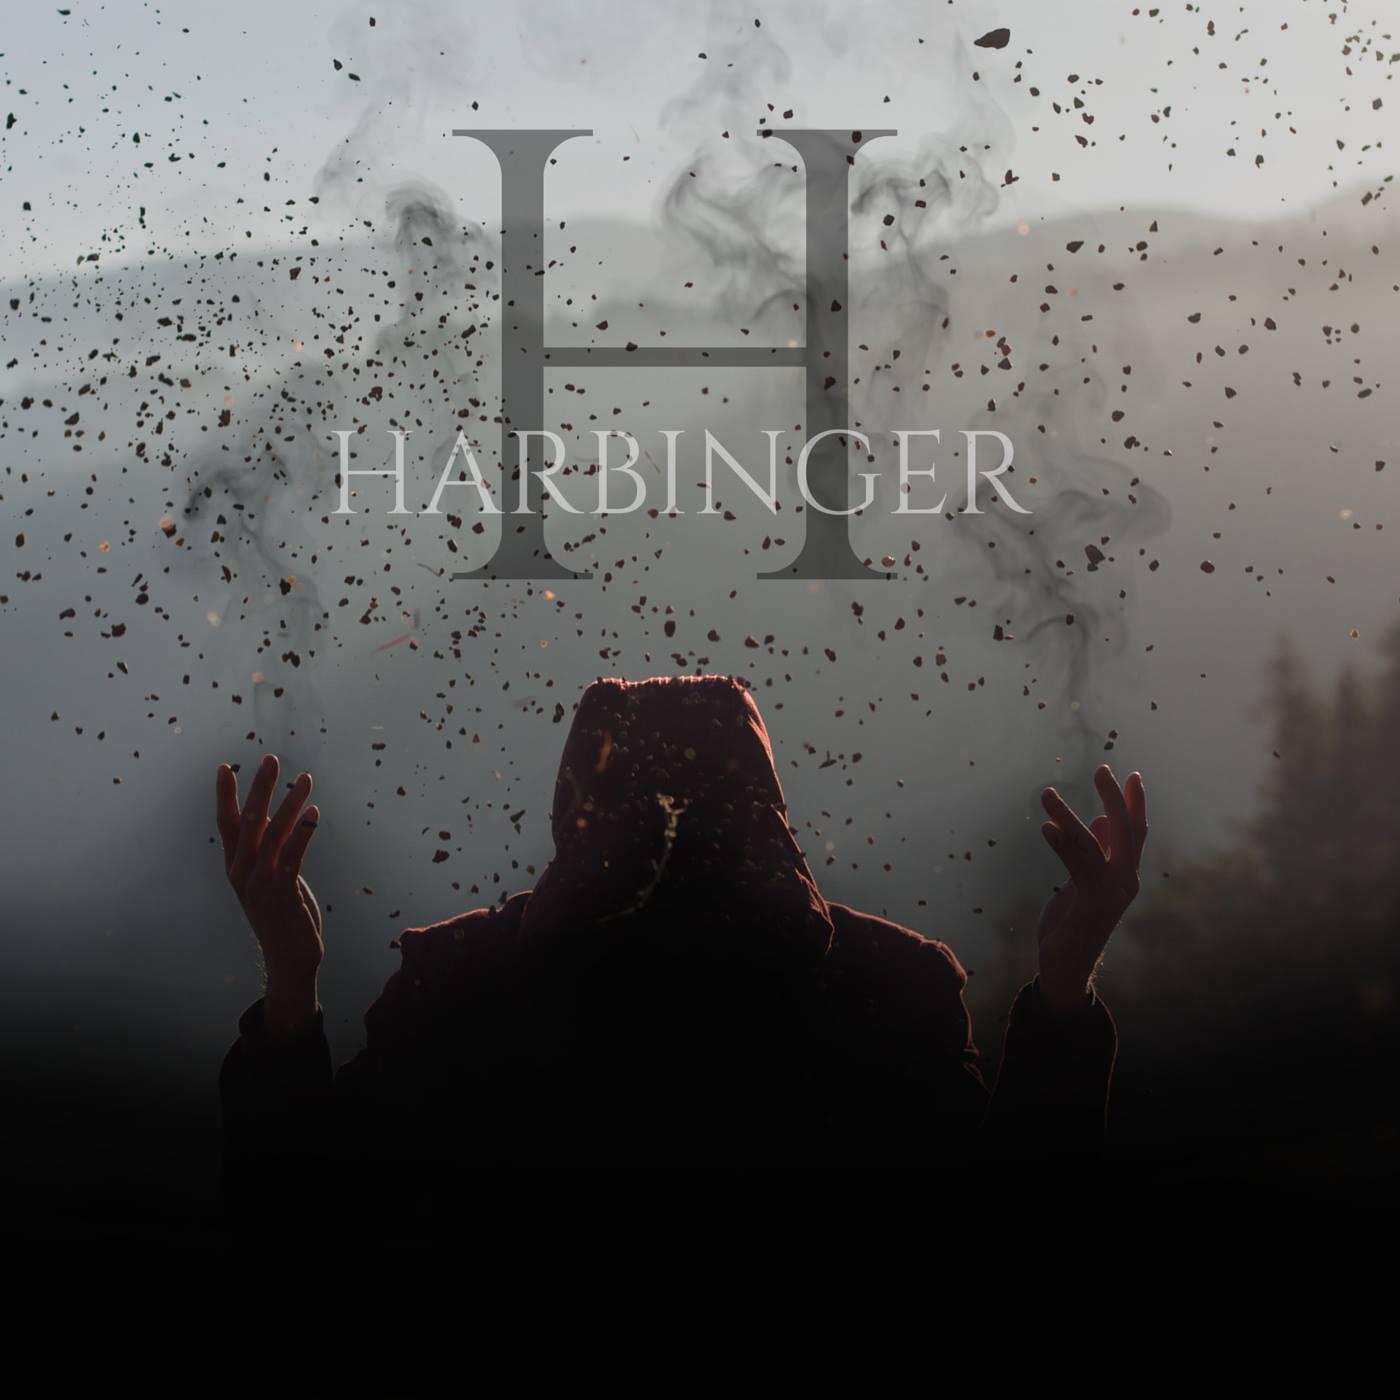 Harbinger - Altered States [Debut Single] (2016)